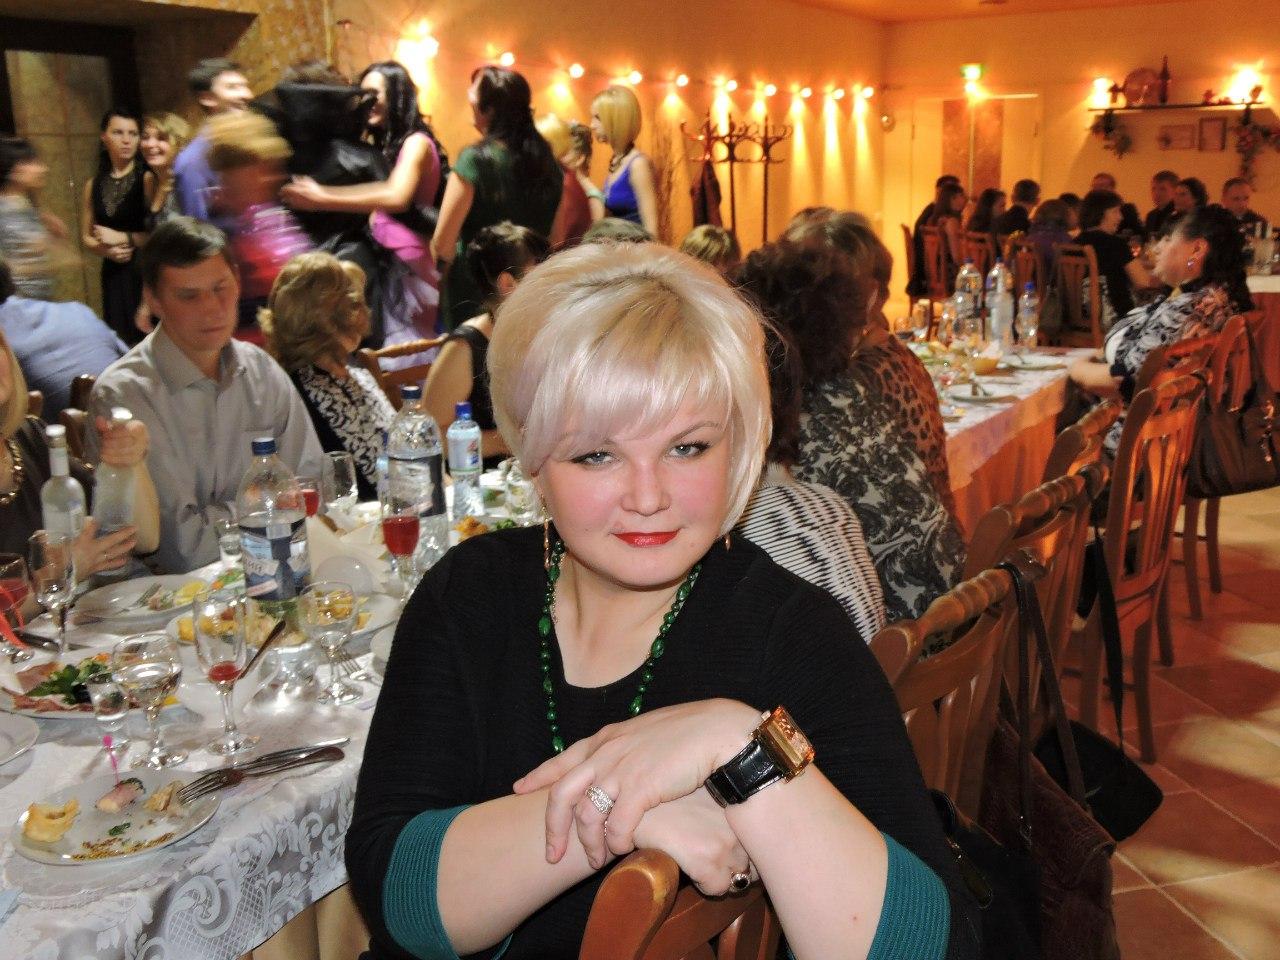 Прокофьева Наталья Александровна Великий Новгород Порно Видео